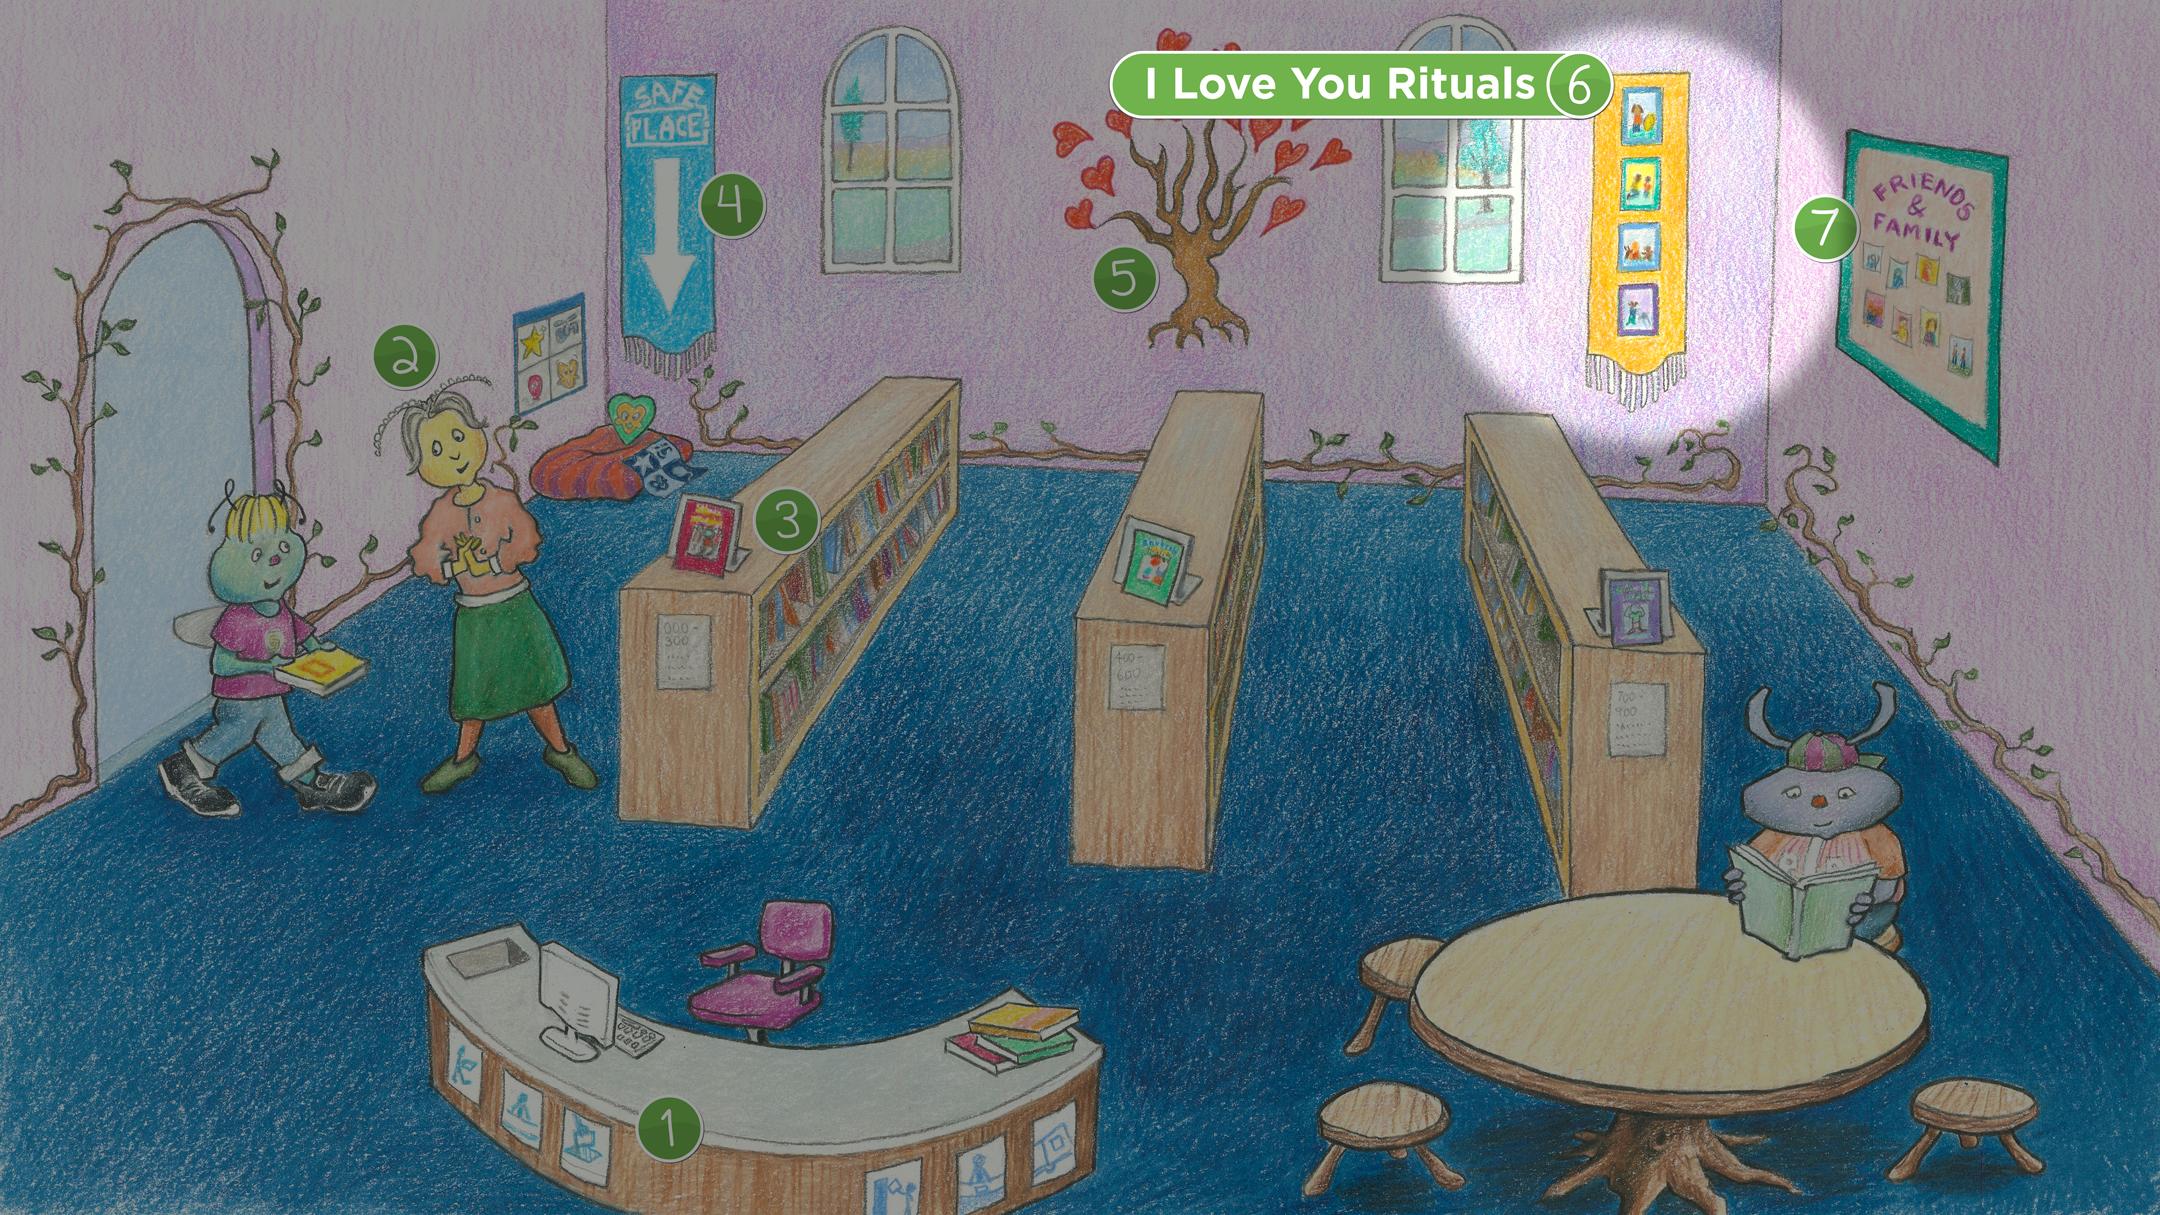 Media Center: I Love You Rituals